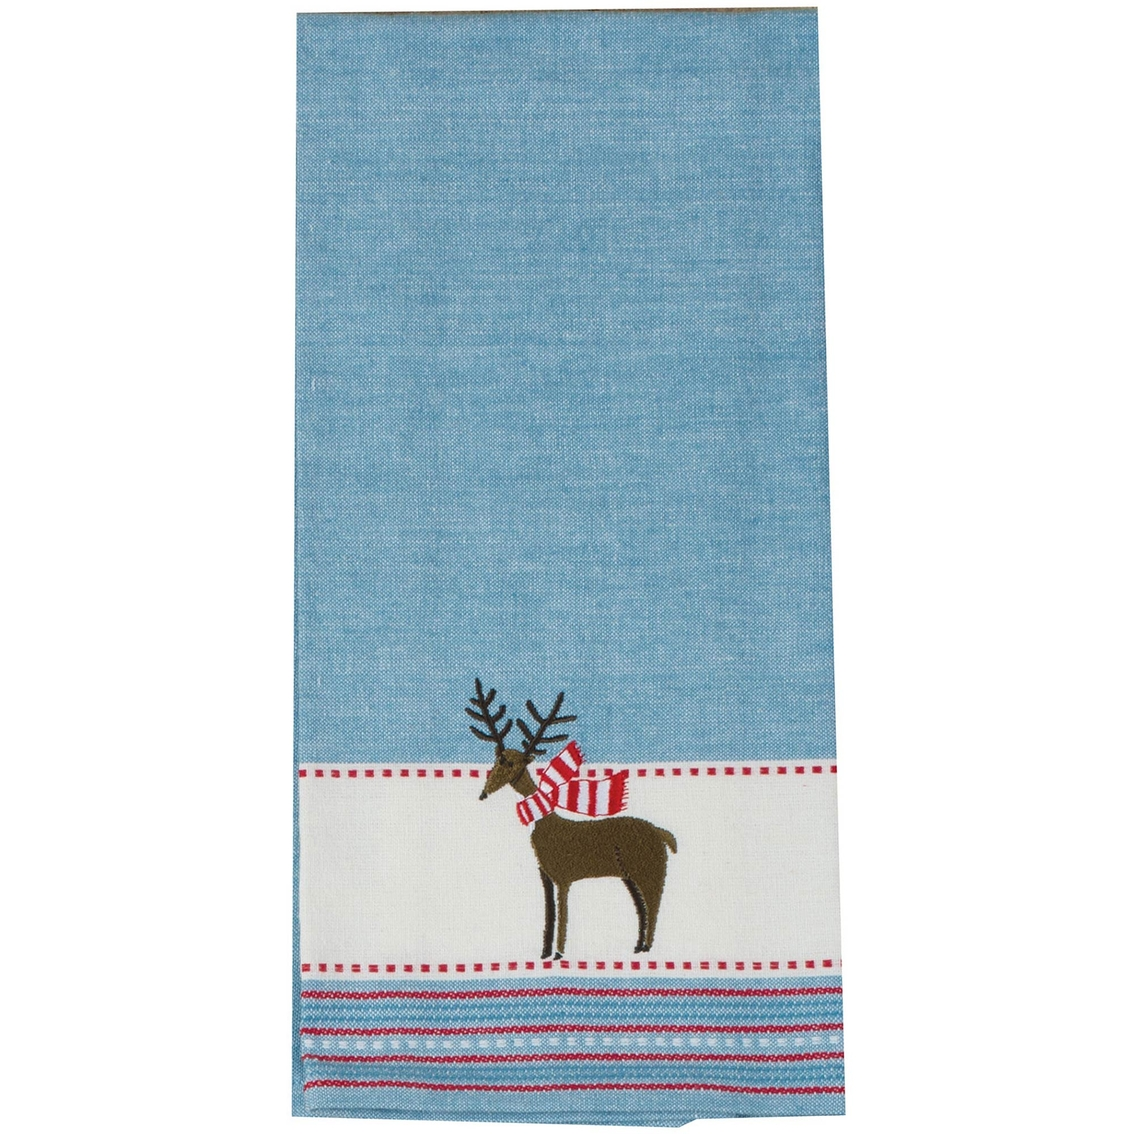 Kay Dee Designs Woodland Christmas Embroidered Tea Towel | Kitchen ...